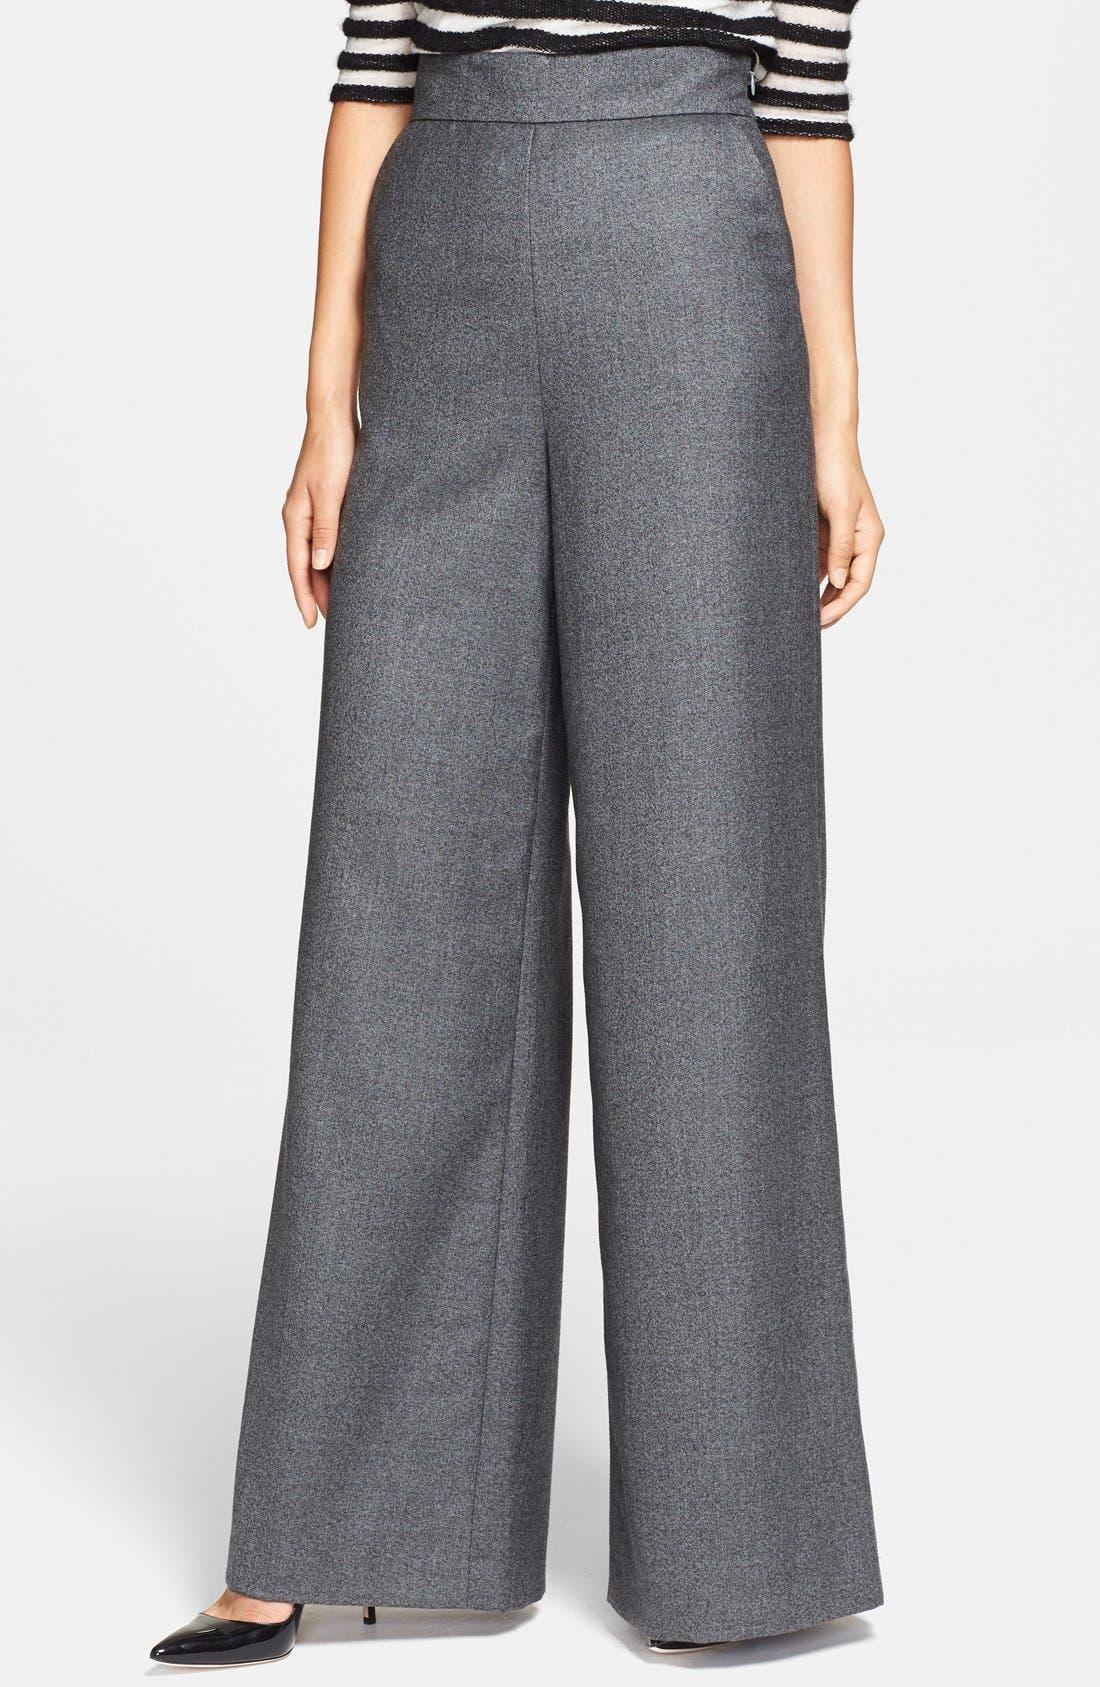 Alternate Image 1 Selected - Rachel Zoe 'Alessia' Wide Leg Trousers